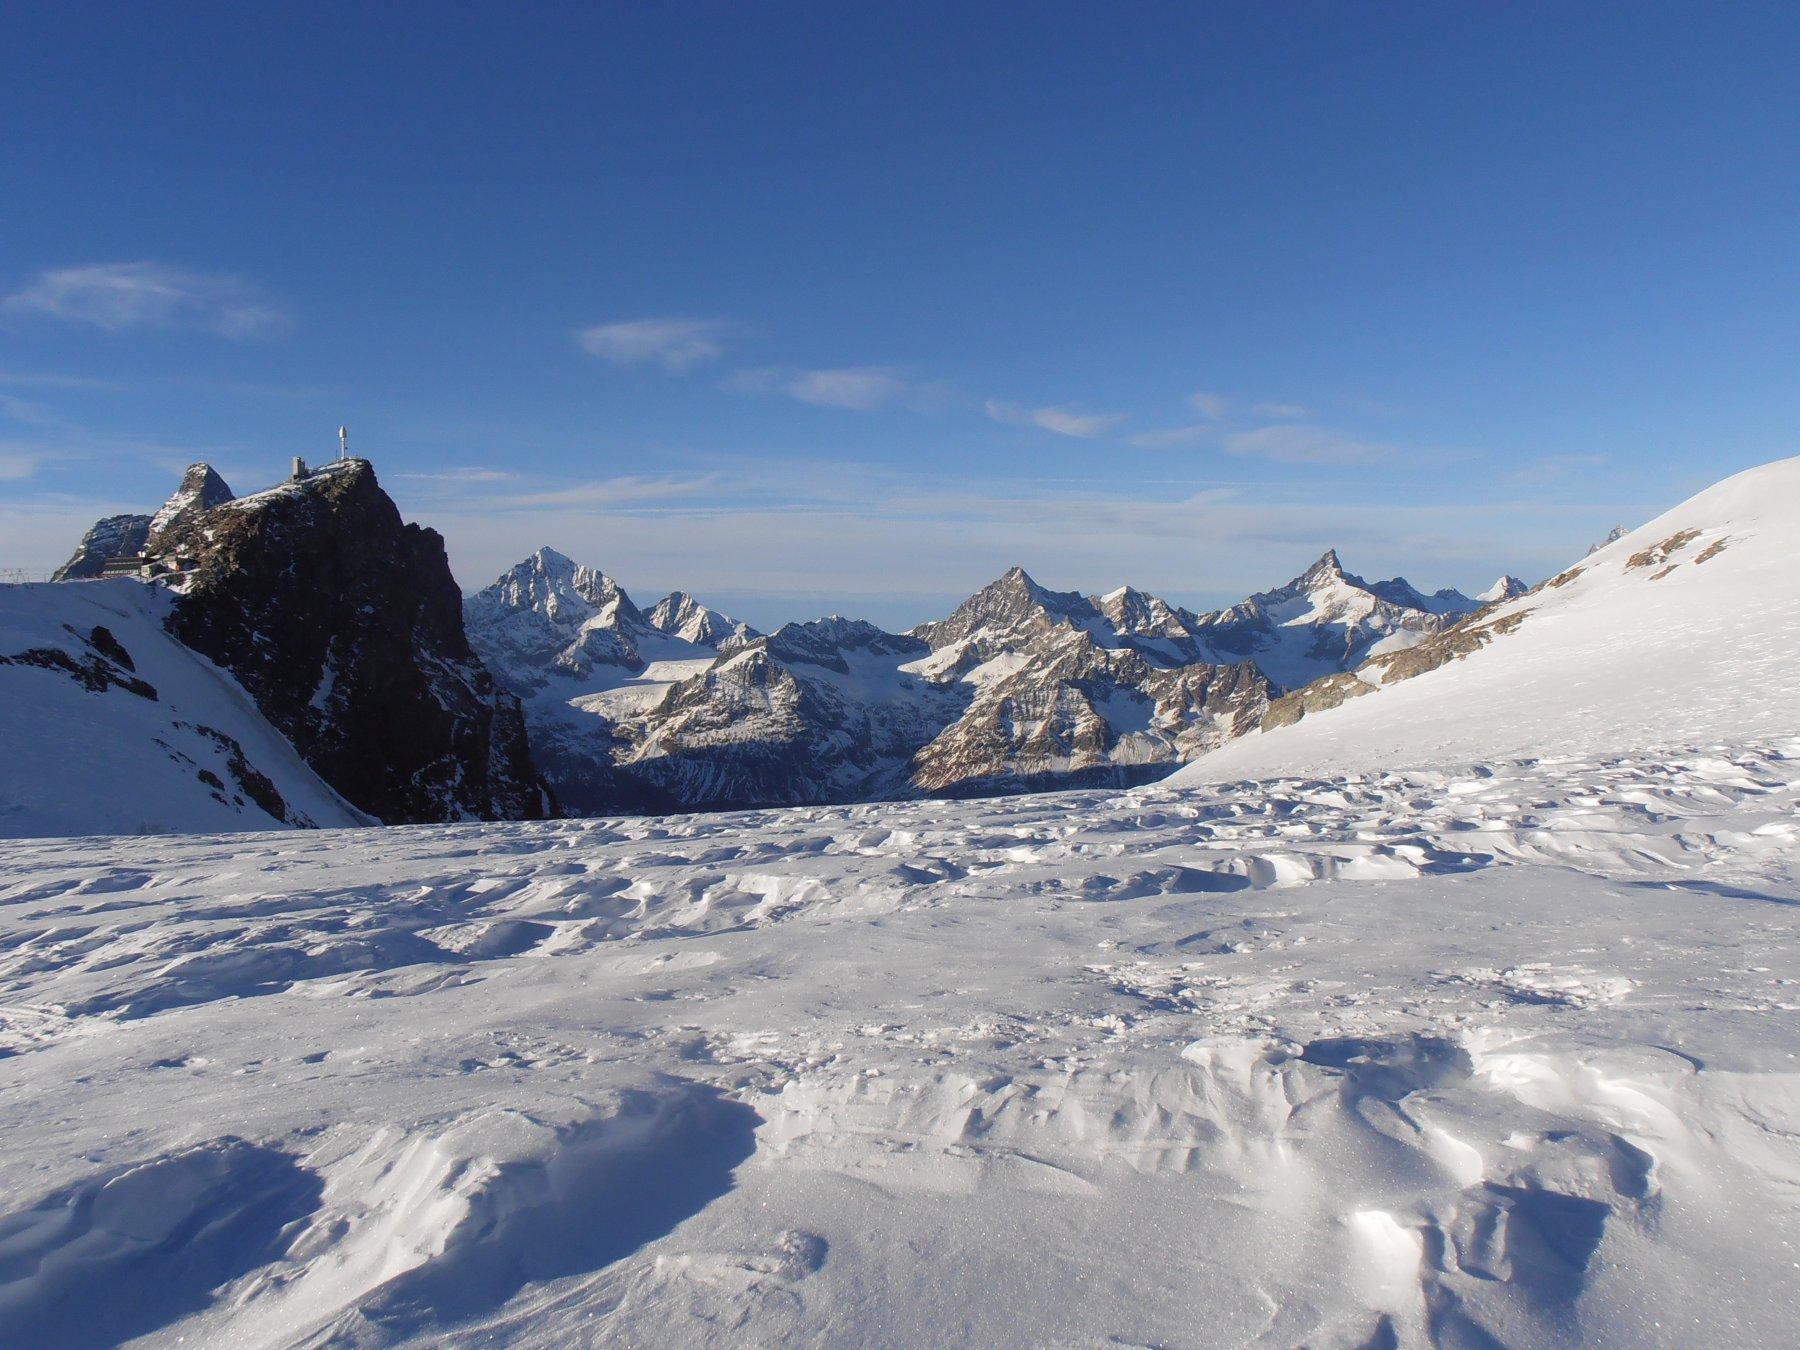 Grandi sastrugi gelati sul Plateau del Breitorn